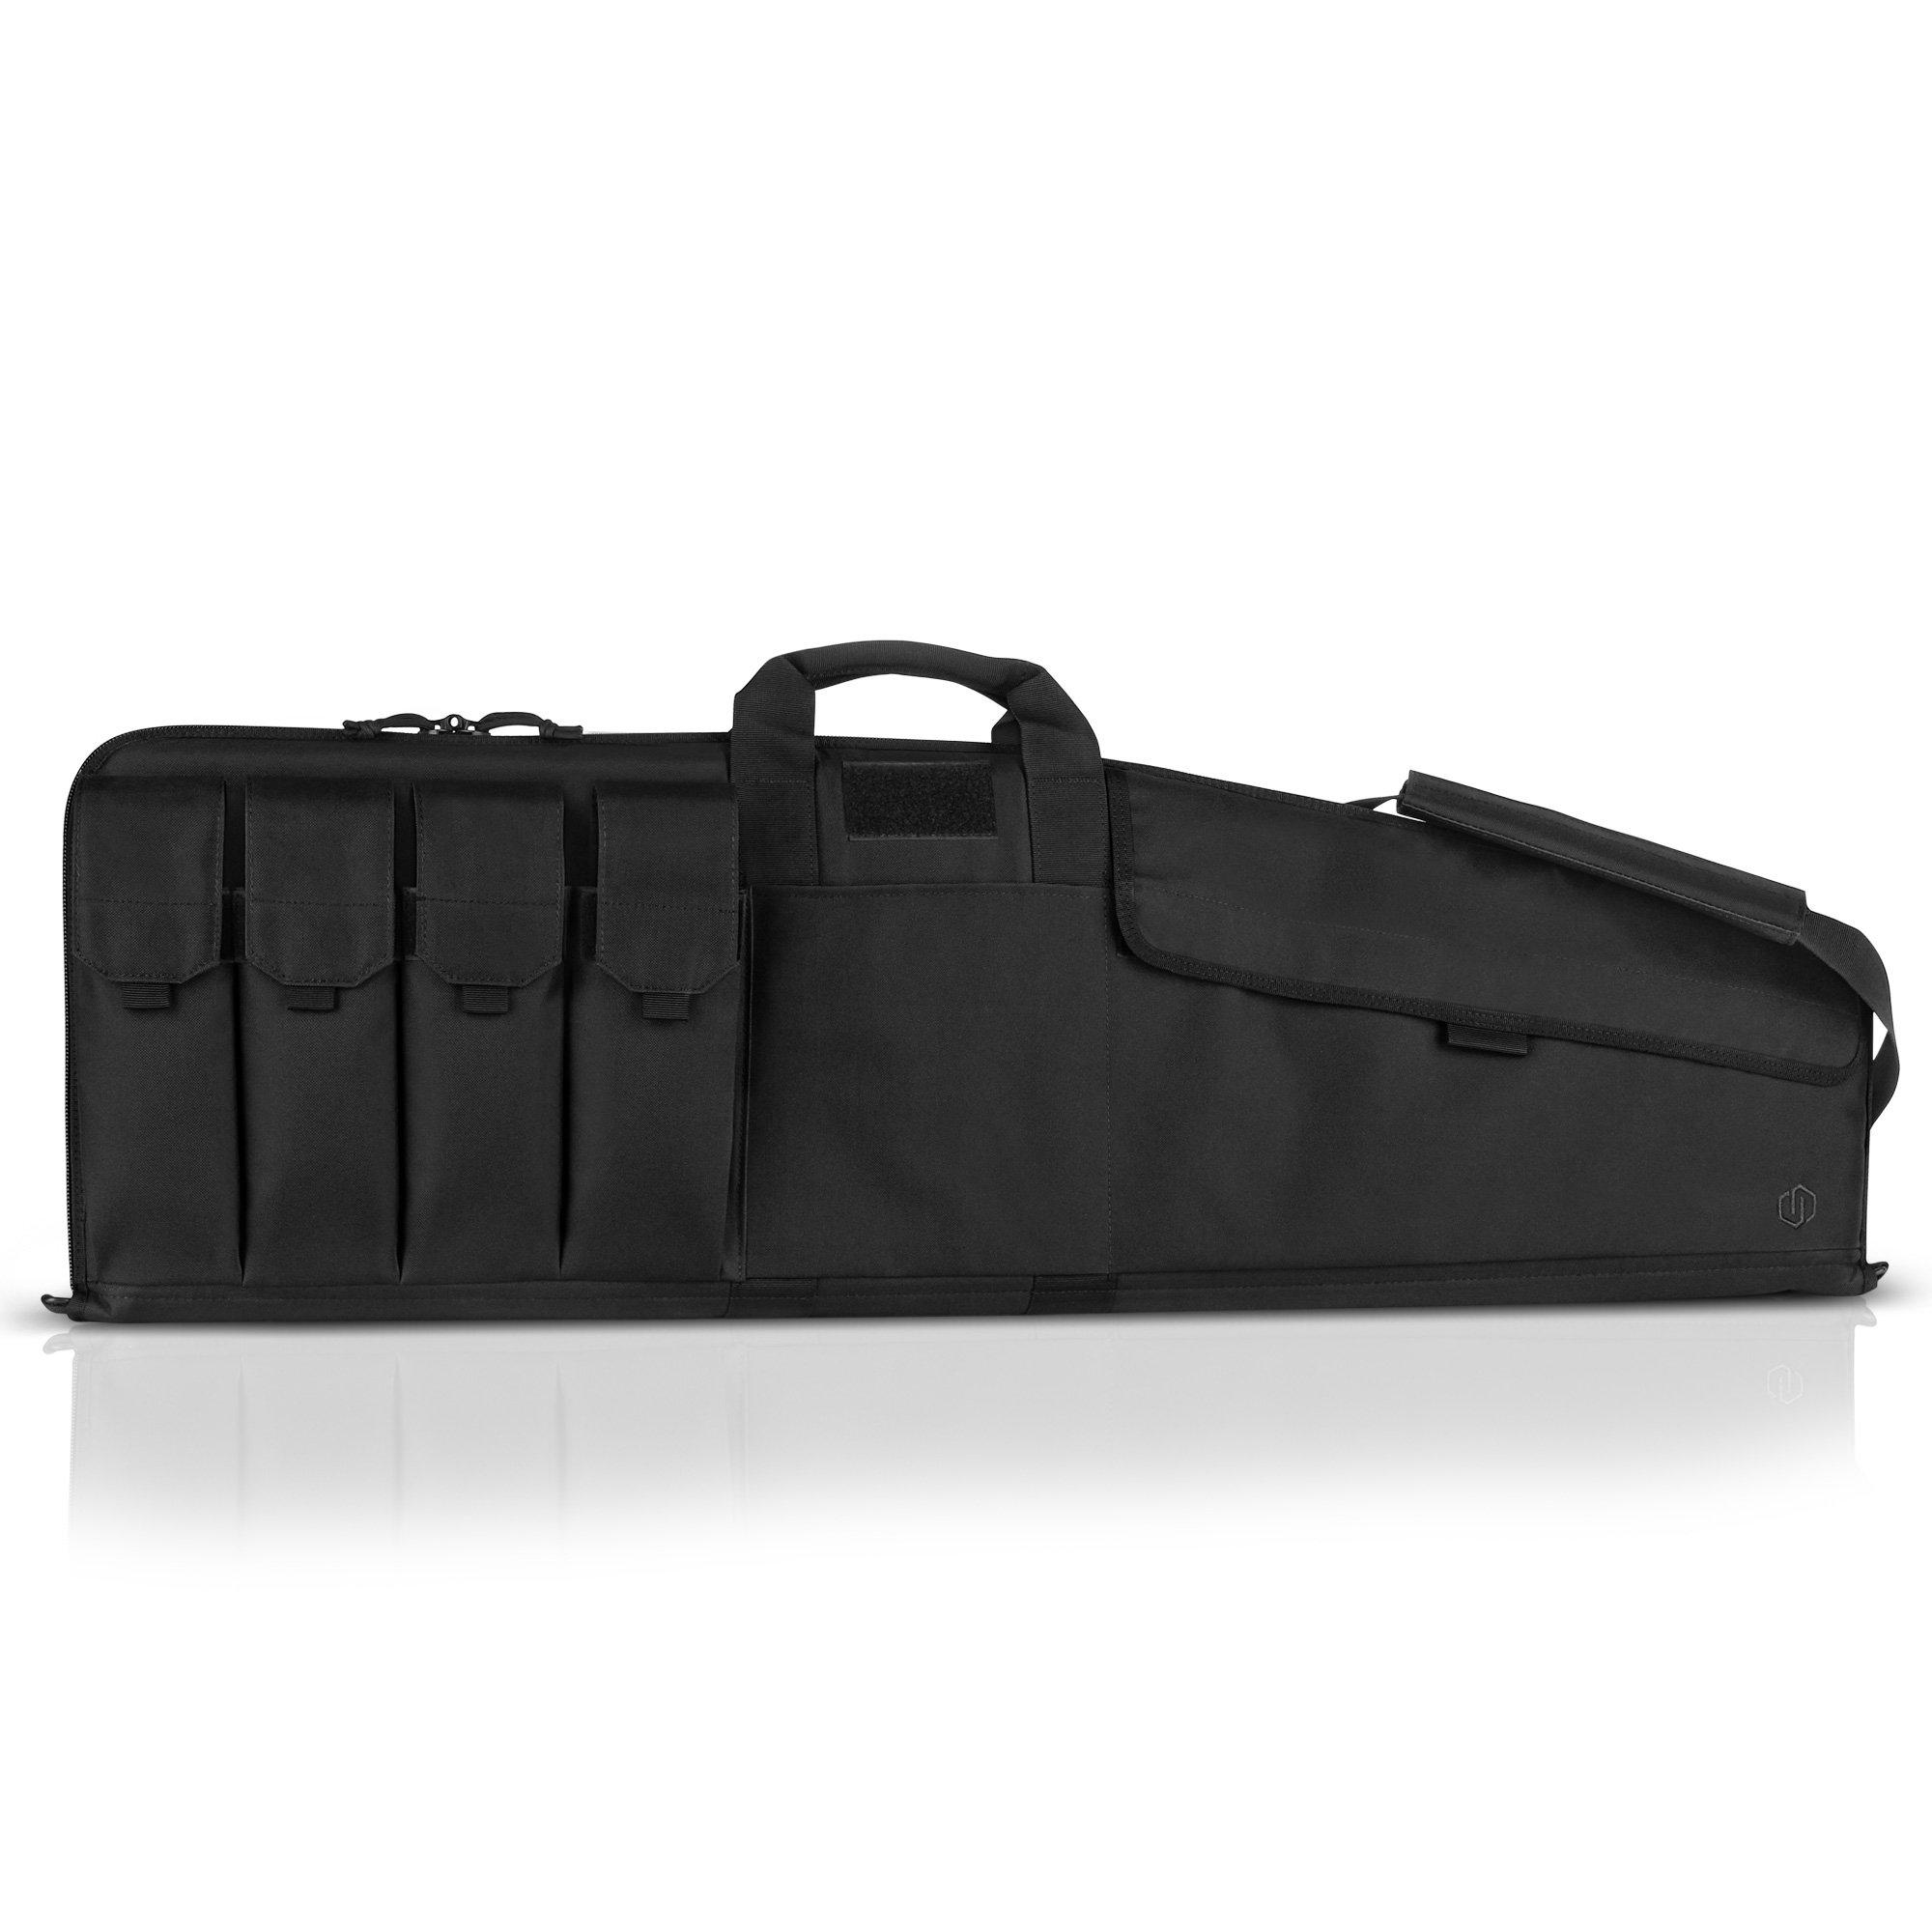 Savior Equipment The Patriot 42'' Single Rifle Gun Tactical Bag - Obsidian Black by Savior Equipment